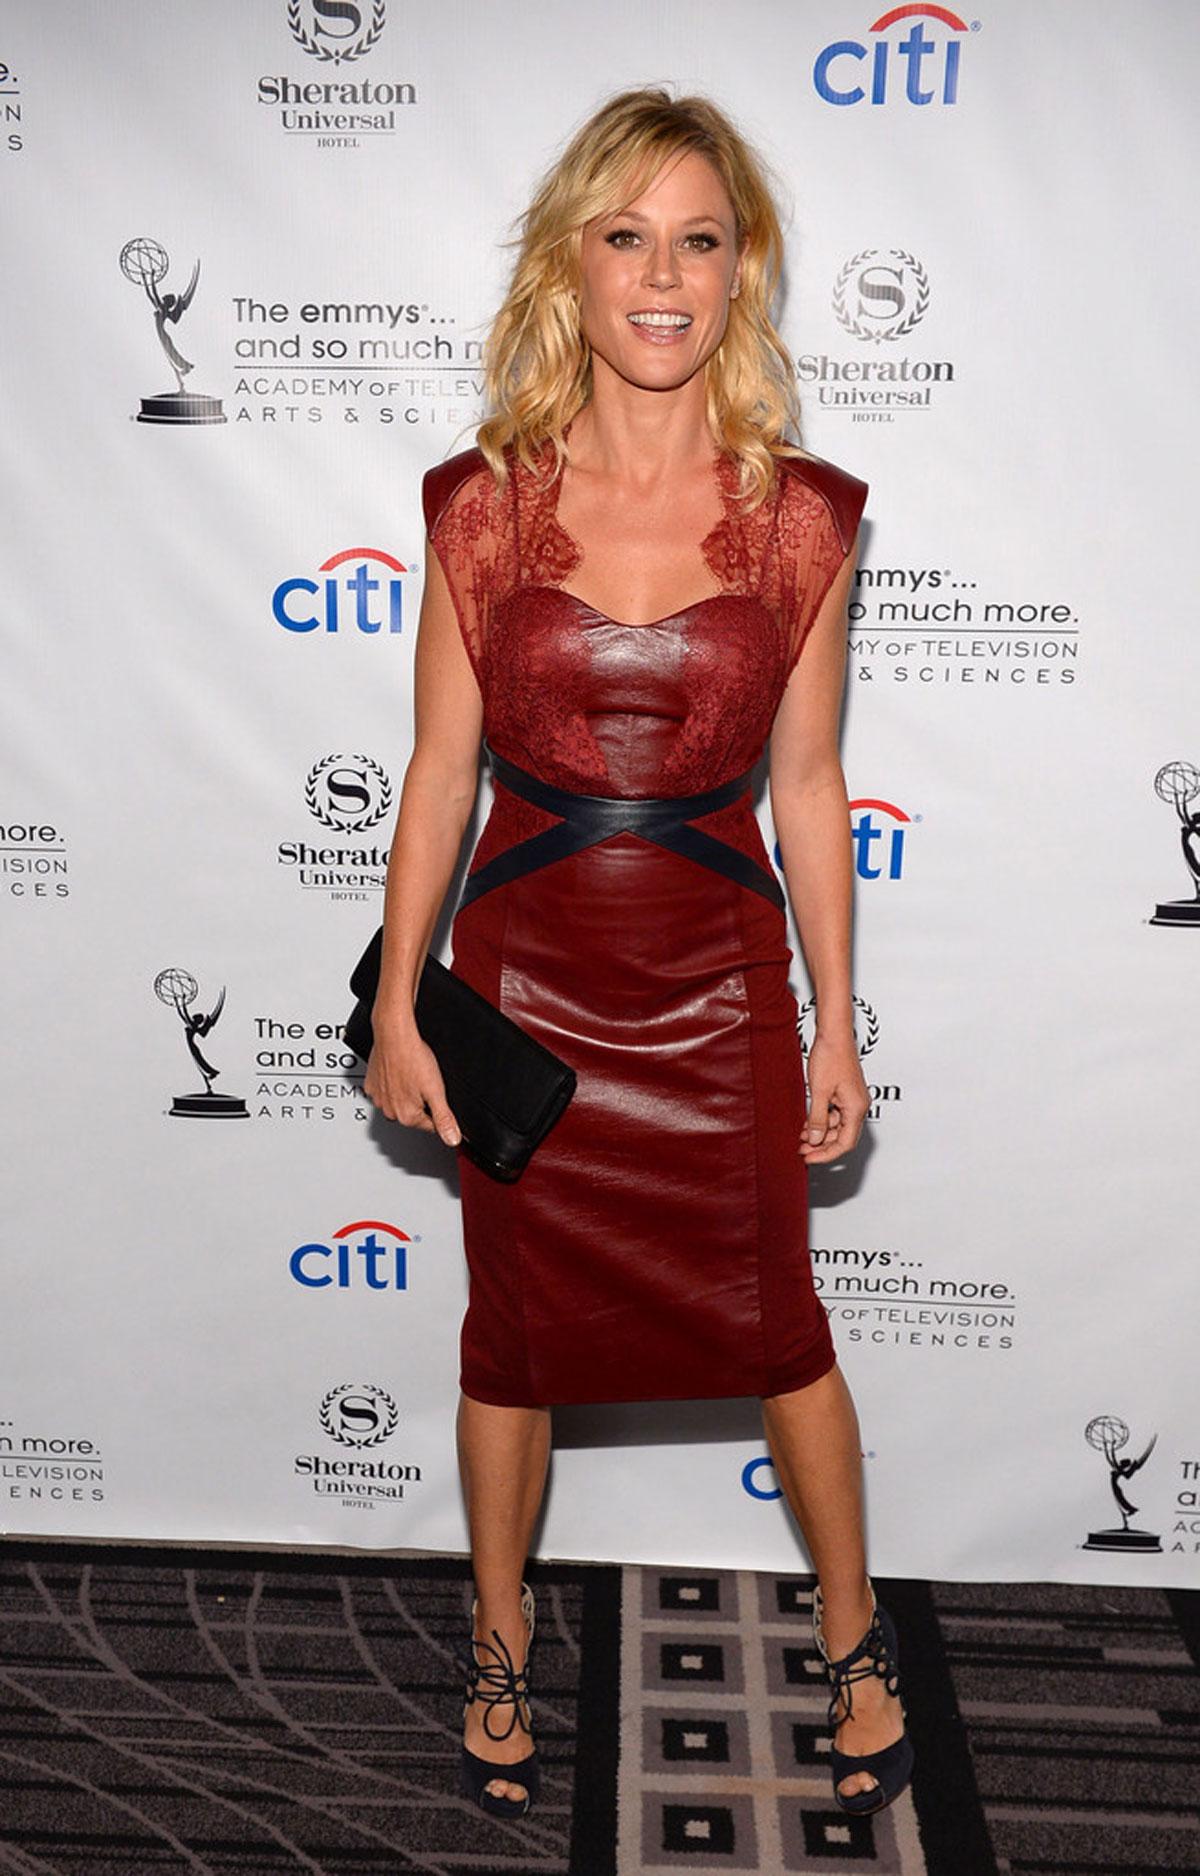 Julie Bowen attends Pre-Emmy Awards Peer Group Cocktail Reception